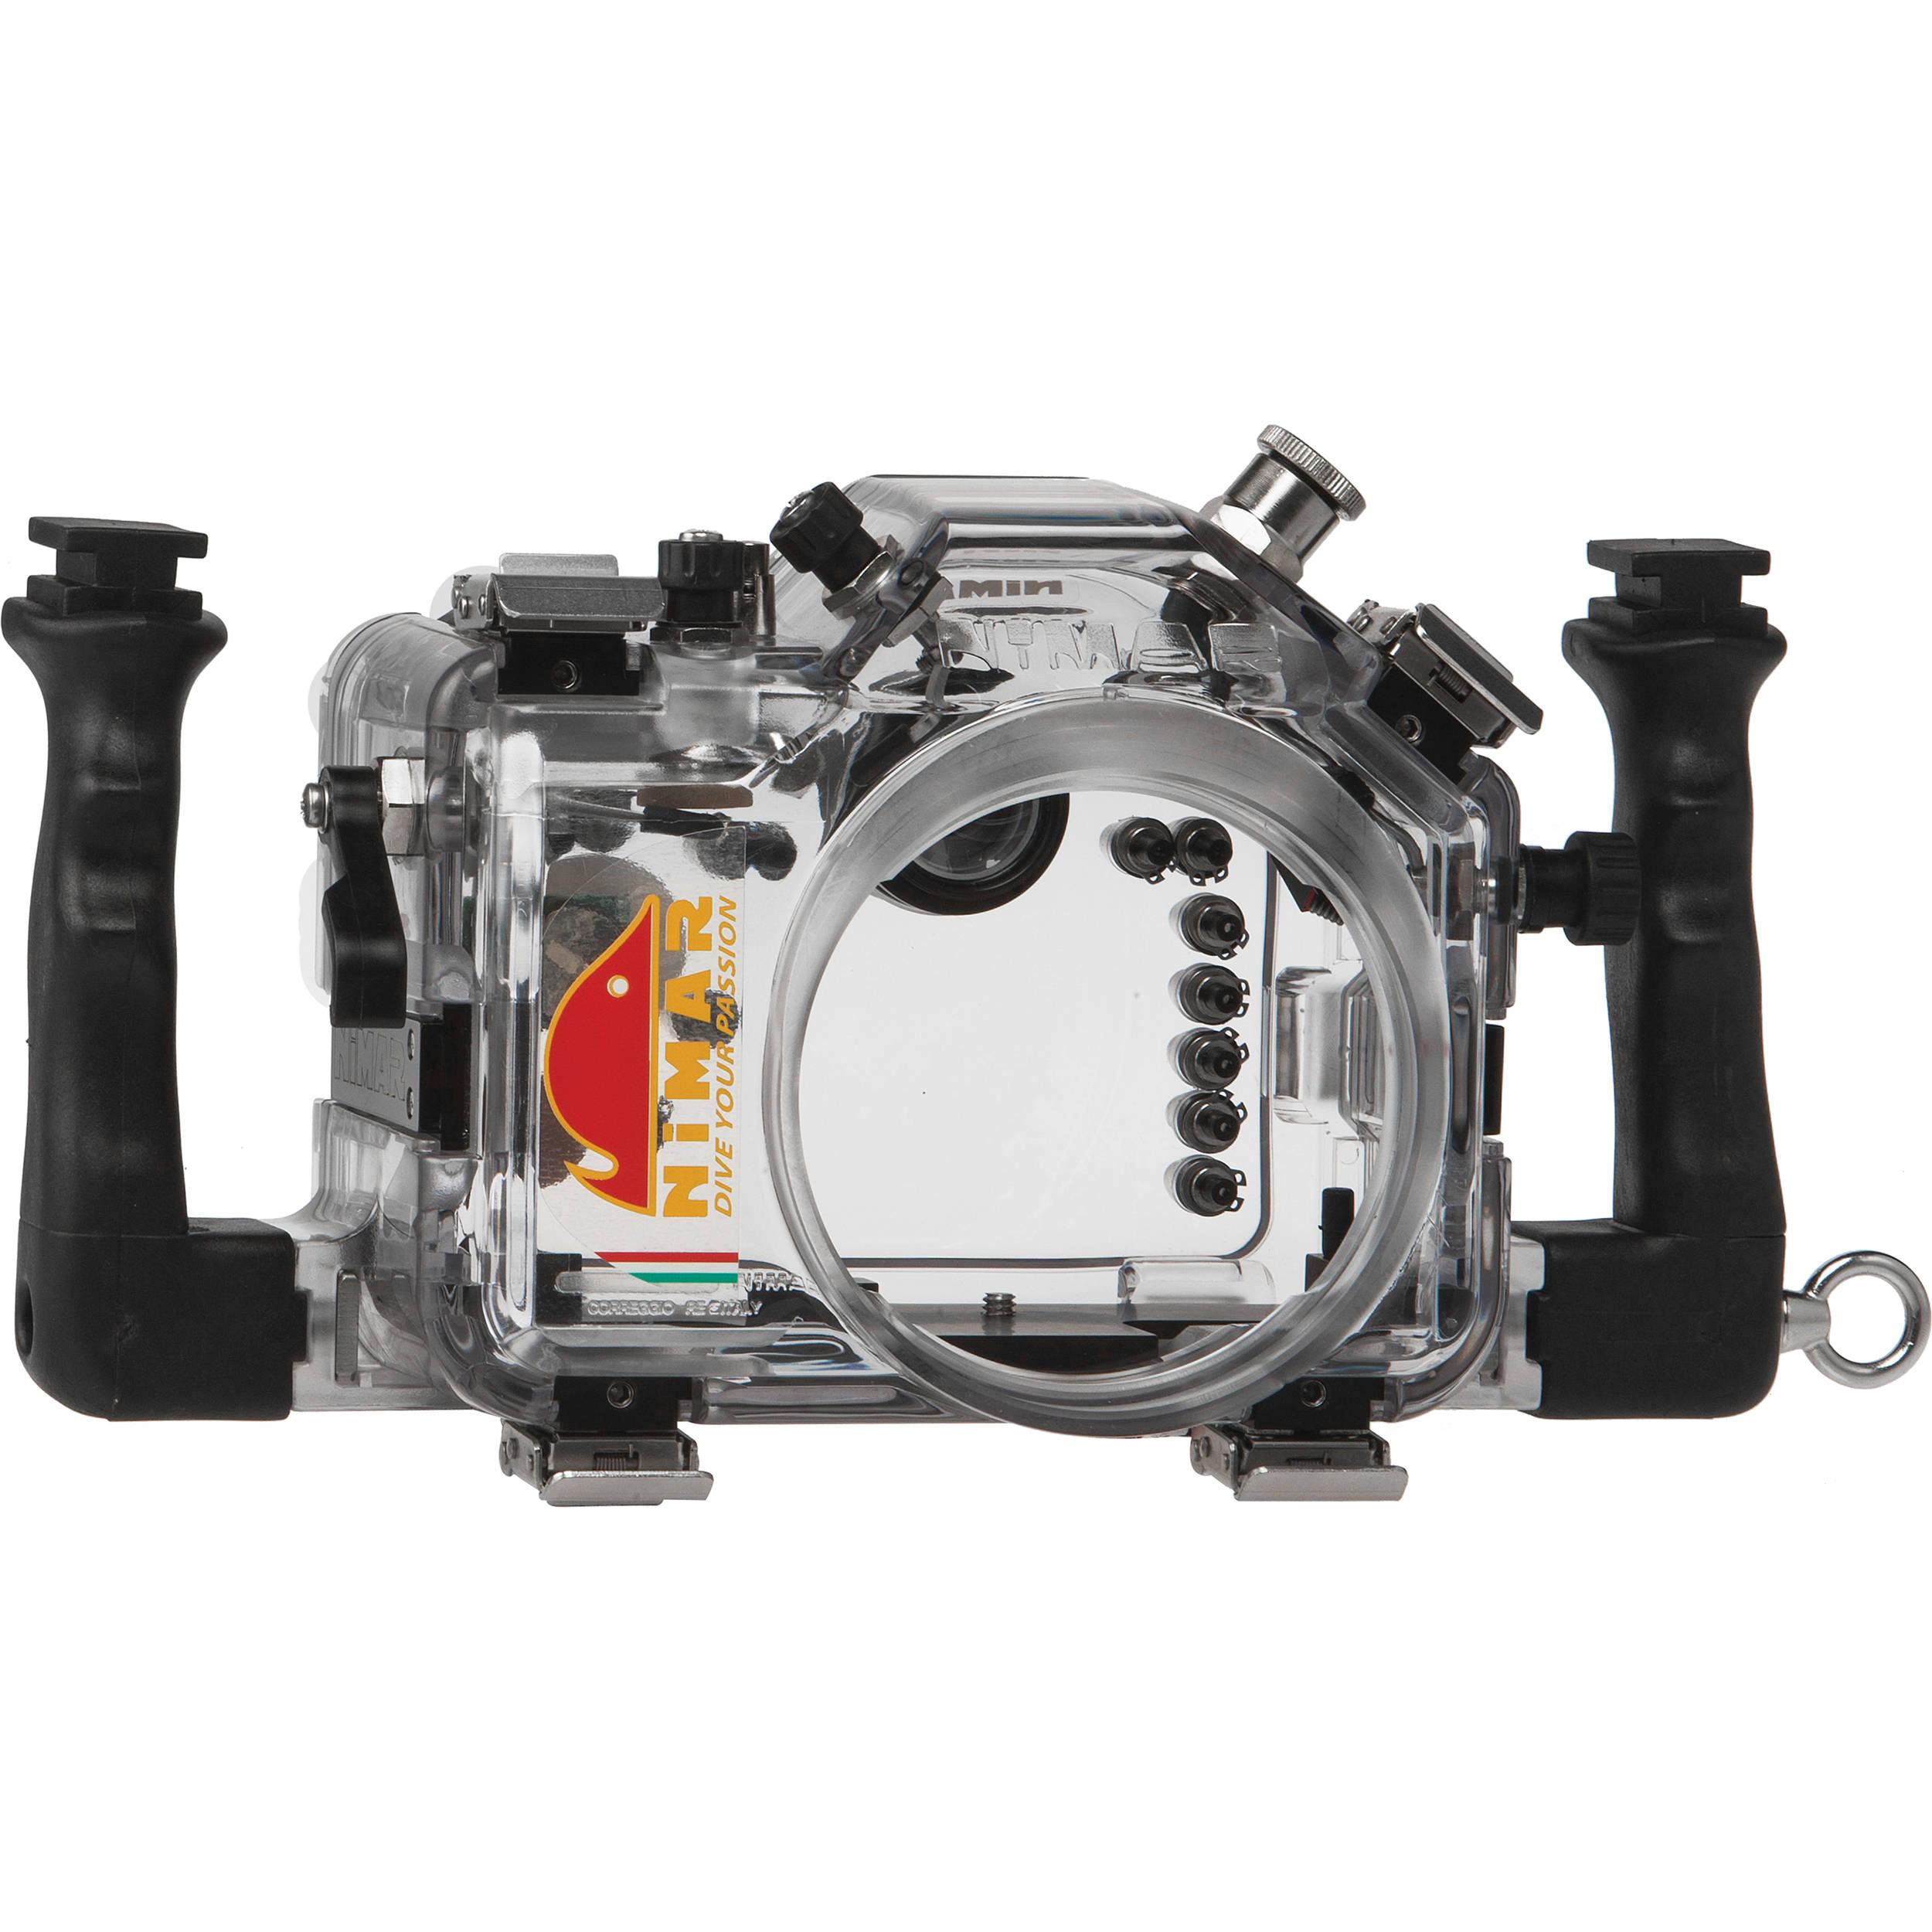 Camera Dslr Underwater Camera nimar 3d underwater housing for canon eos 70d dslr camera ni70d camera